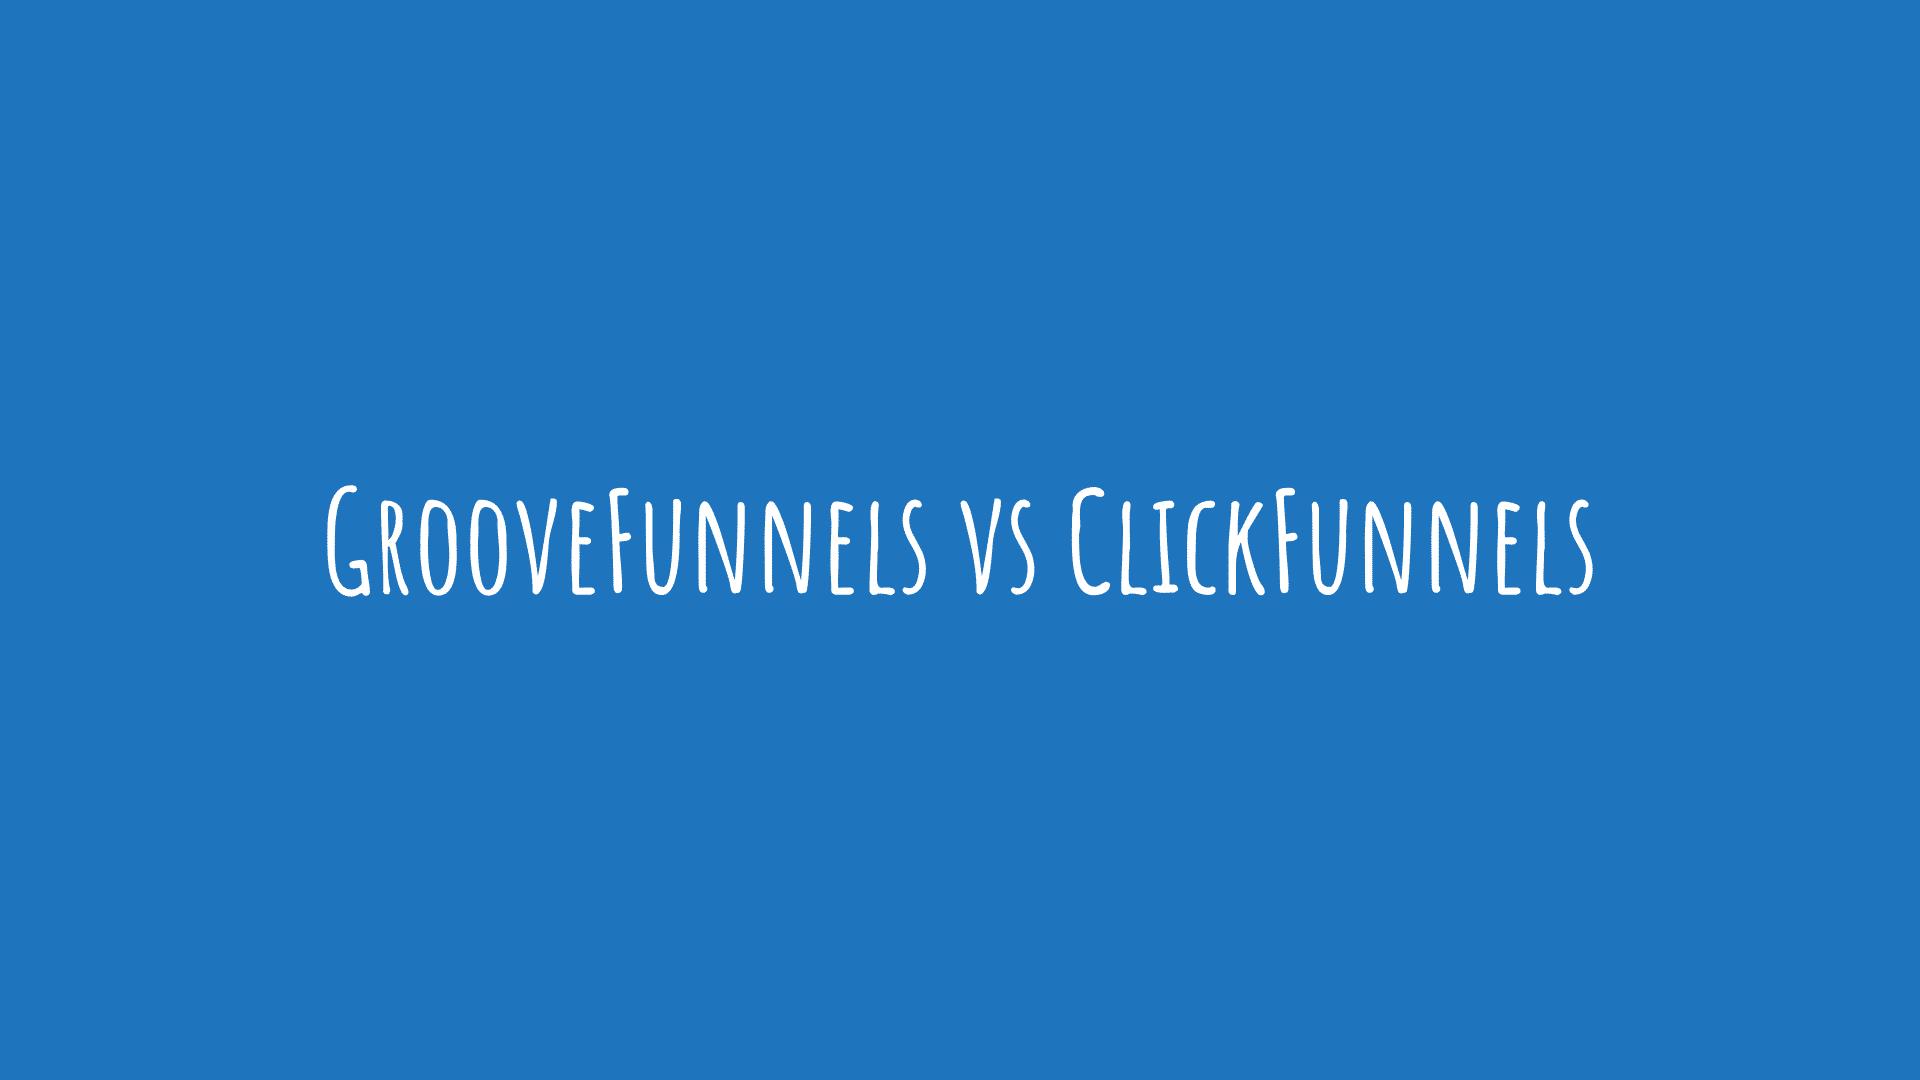 GrooveFunnels vs ClickFunnels